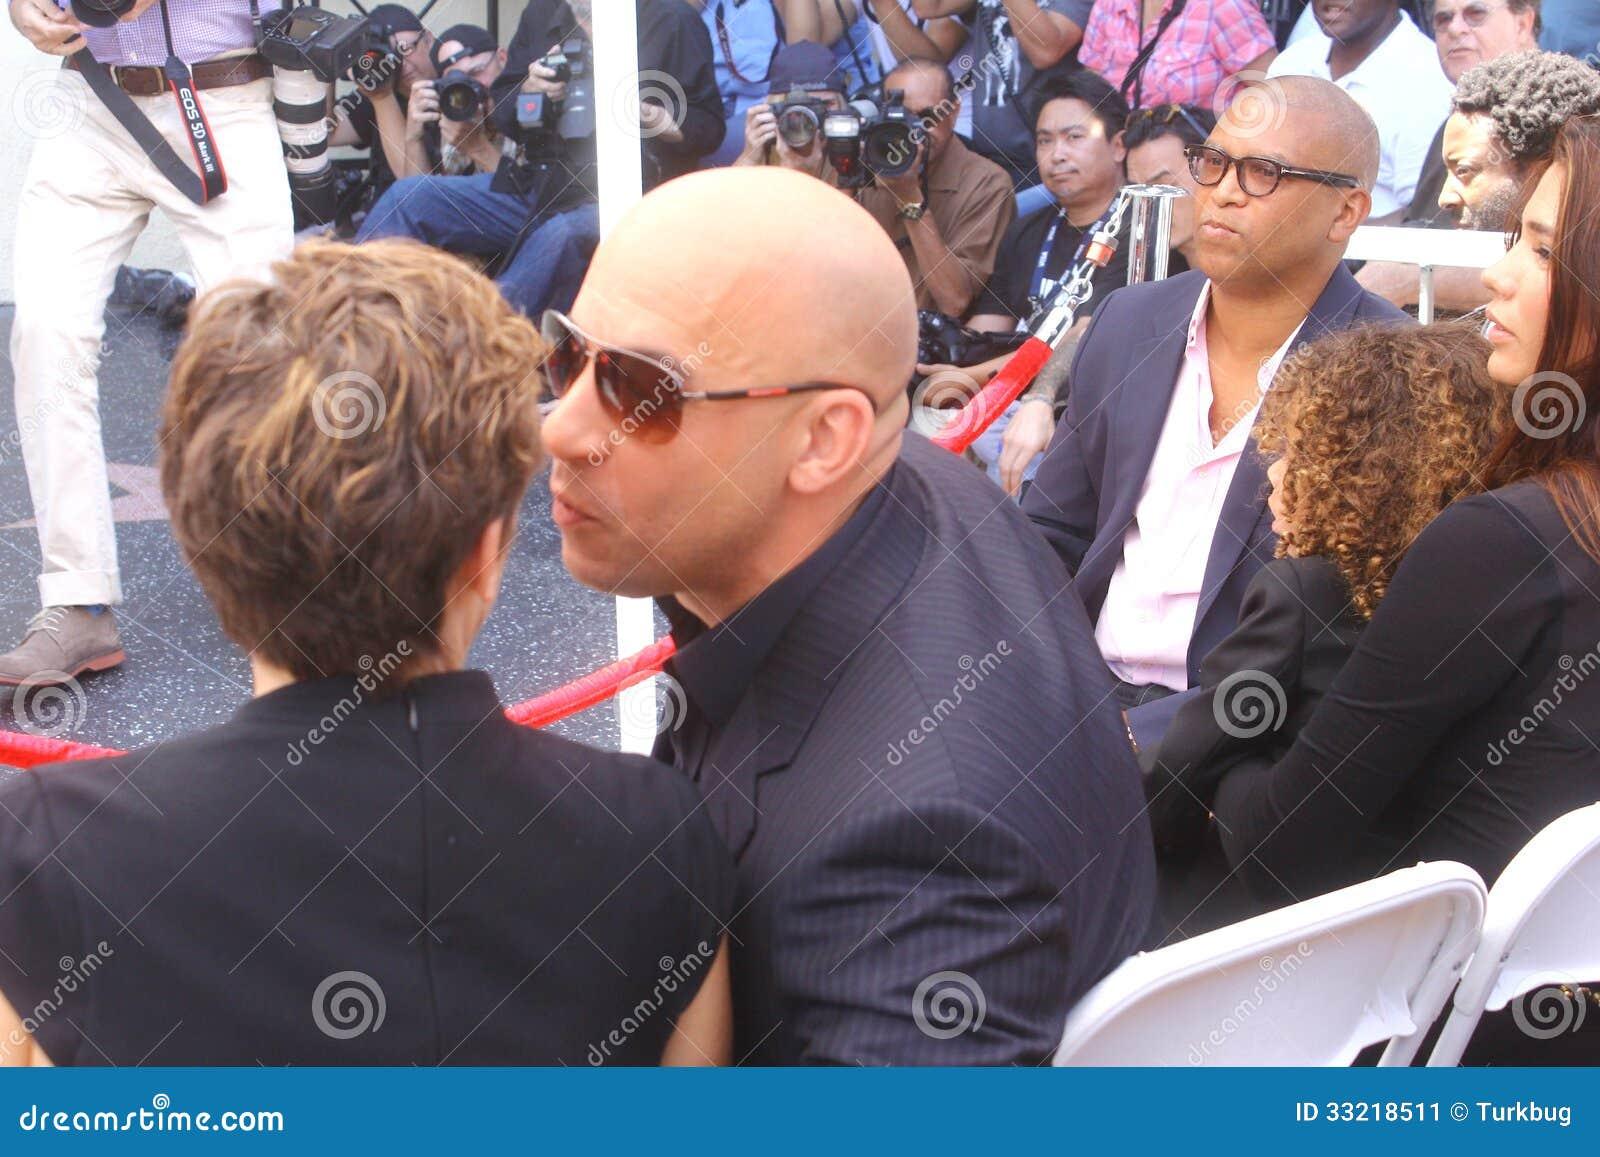 Vin Diesel And Mom Editorial Photo - Image: 33218511Vin Diesel Mother Photos